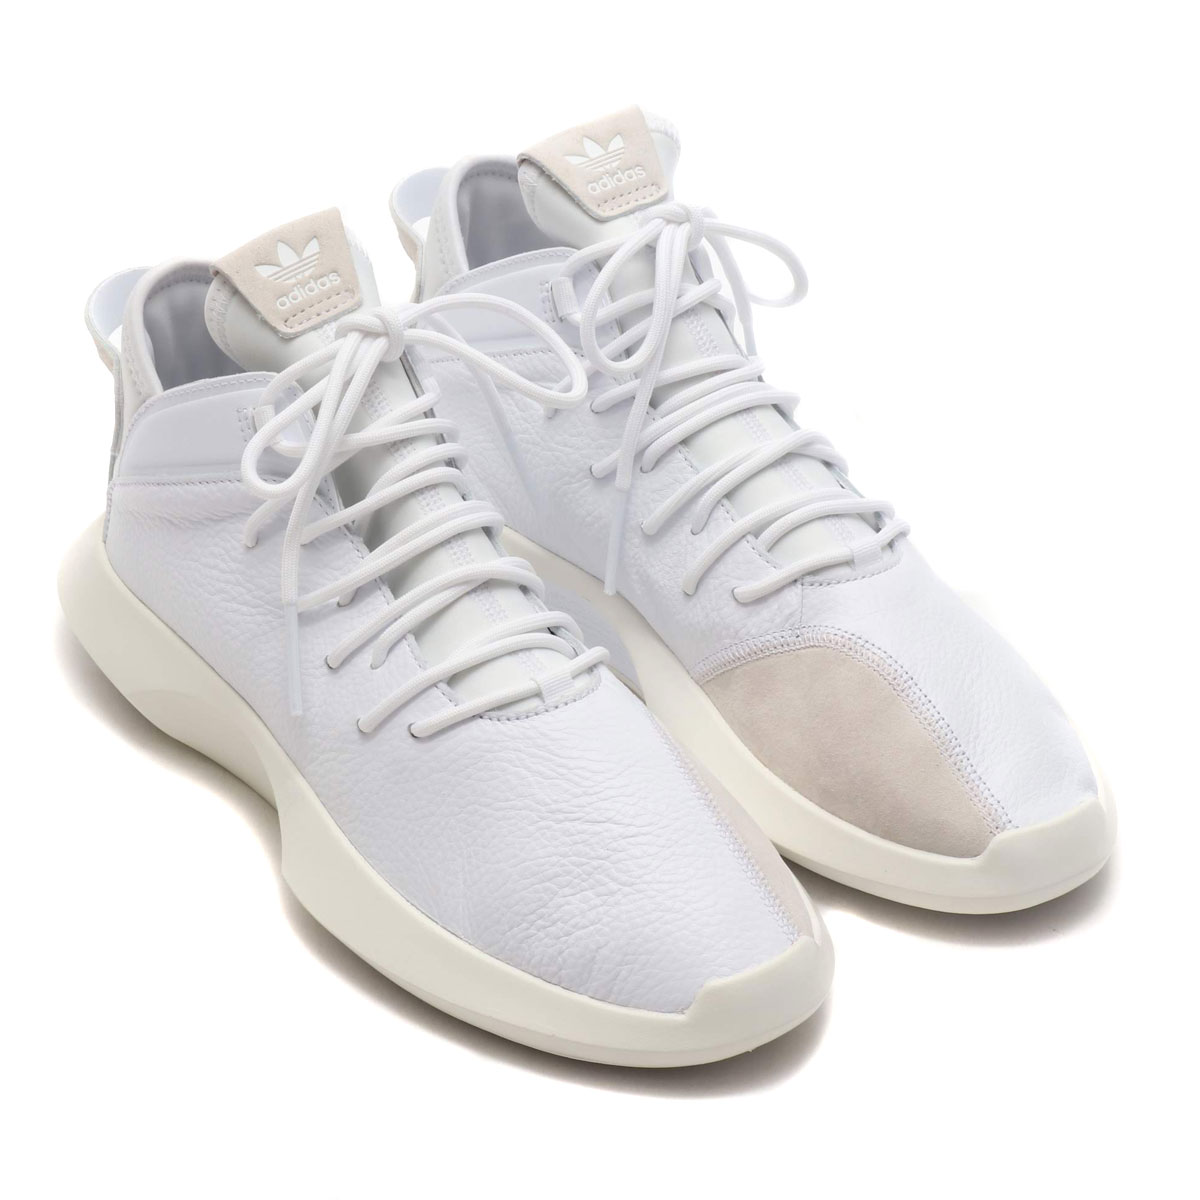 adidas Originals CRAZY 1 ADV(アディダスオリジナルス クレイジー 1 ADV)RUNNING WHITE/RUNNING WHITE/SUPPLIER COLOR【メンズ スニーカー】19SS-I